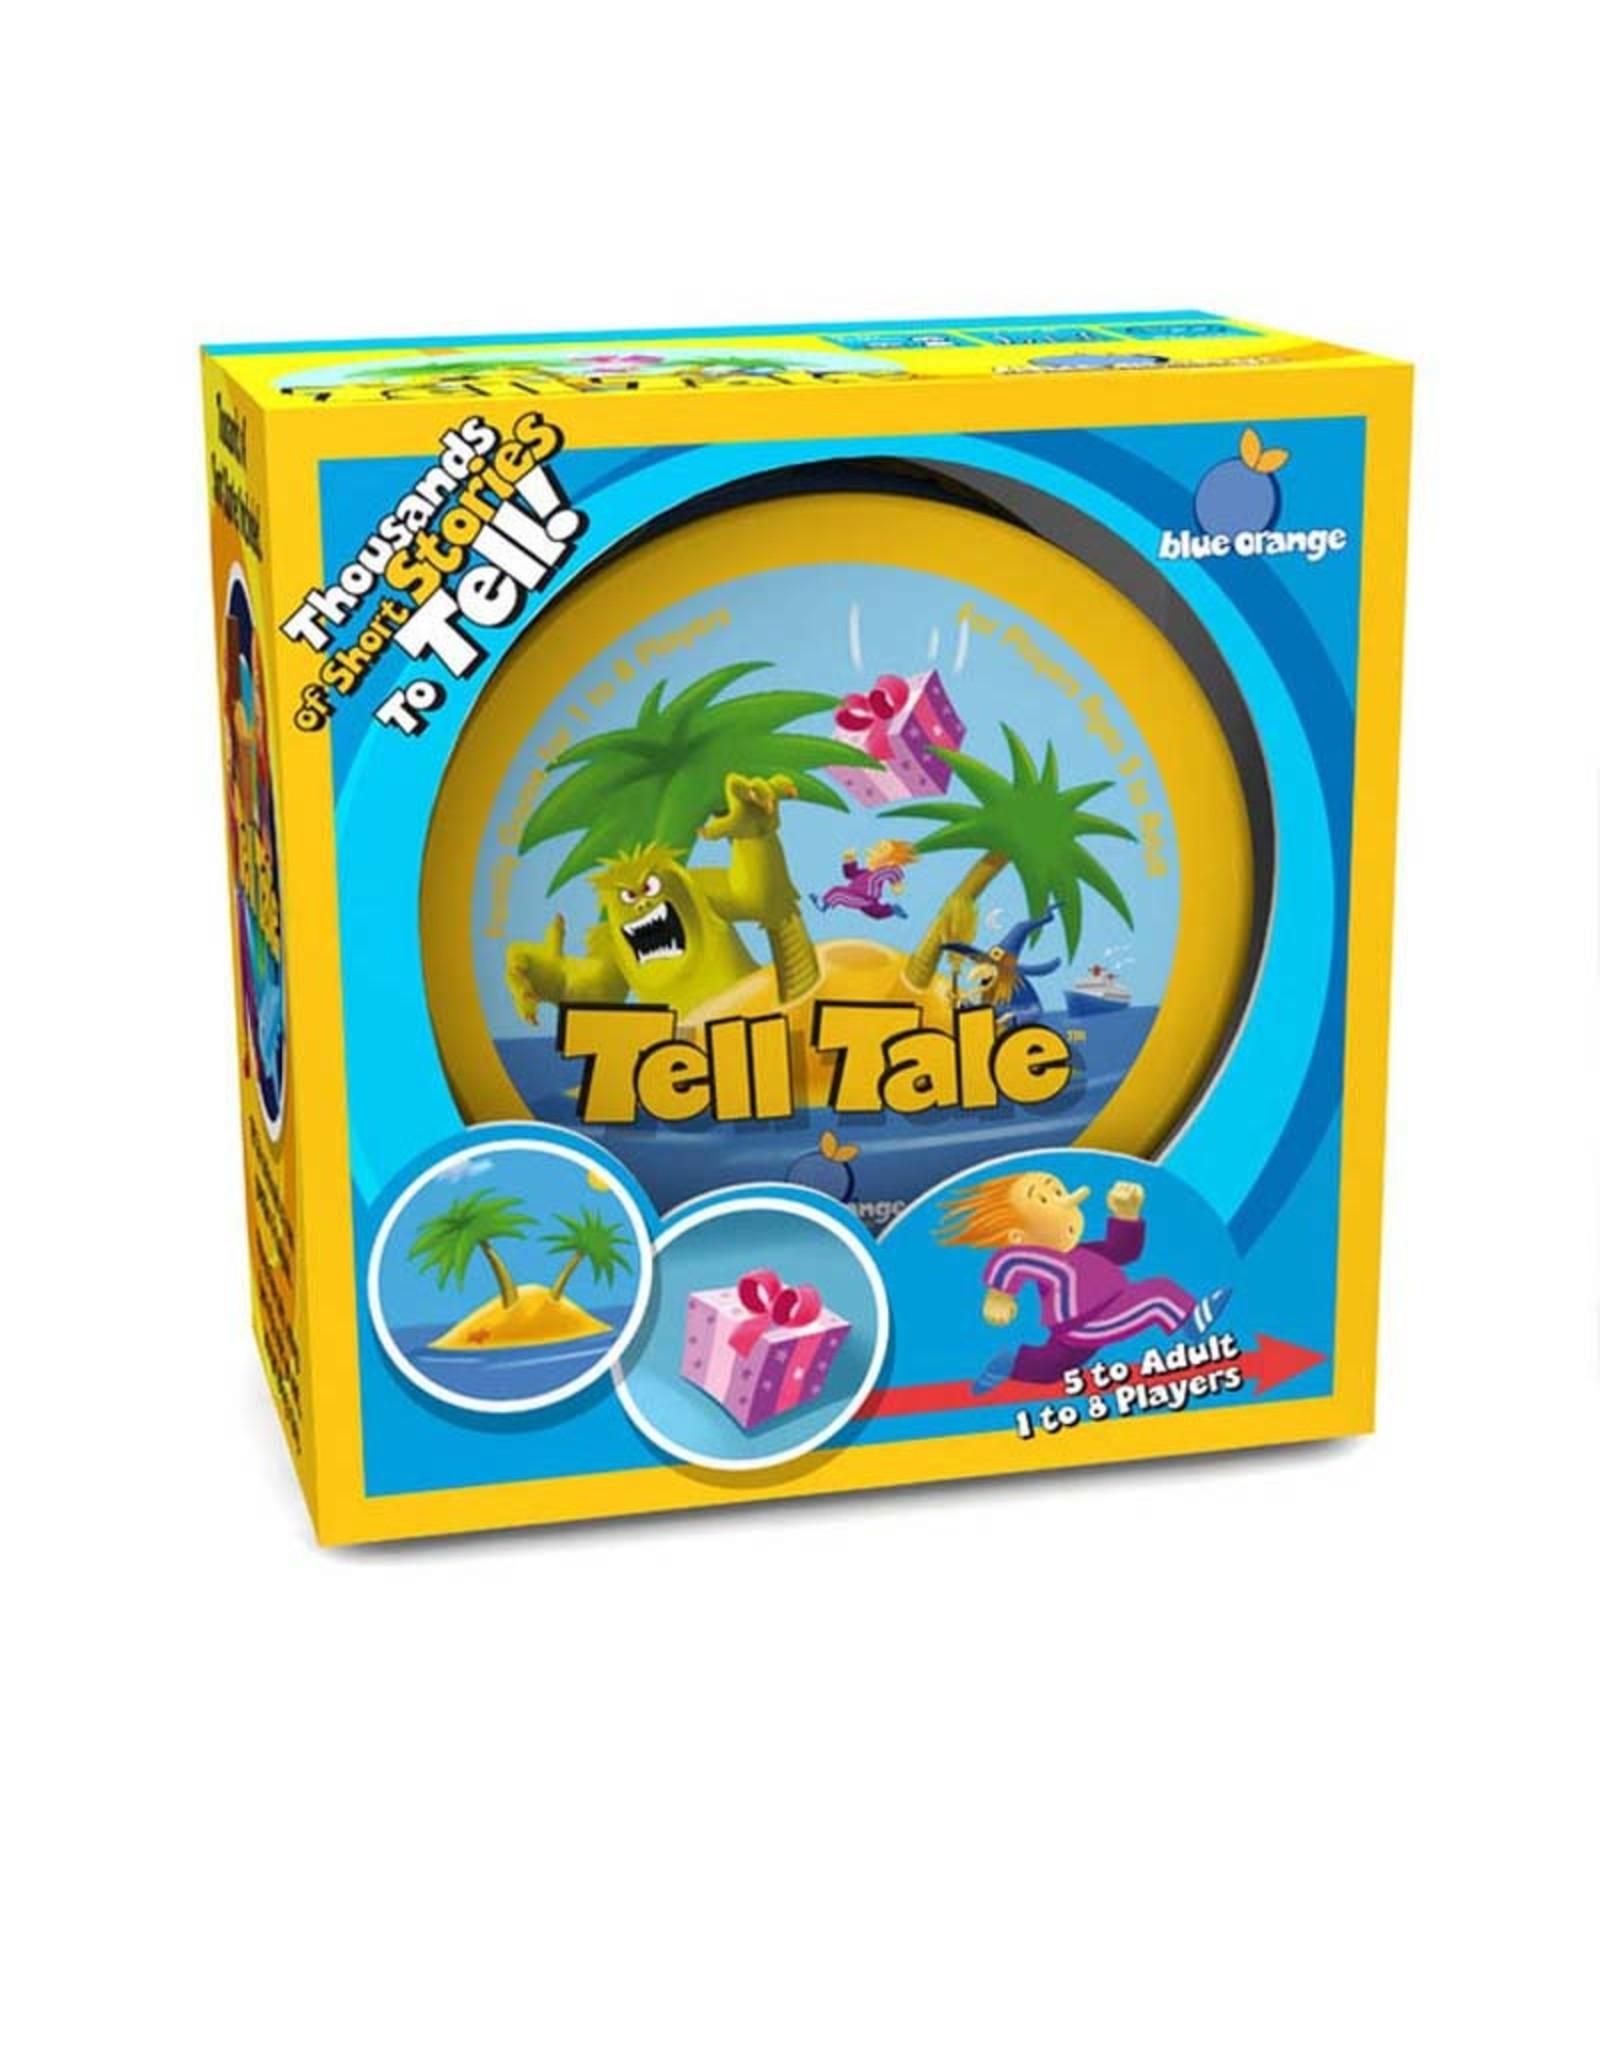 Blue Orange Games ##Tell Tale